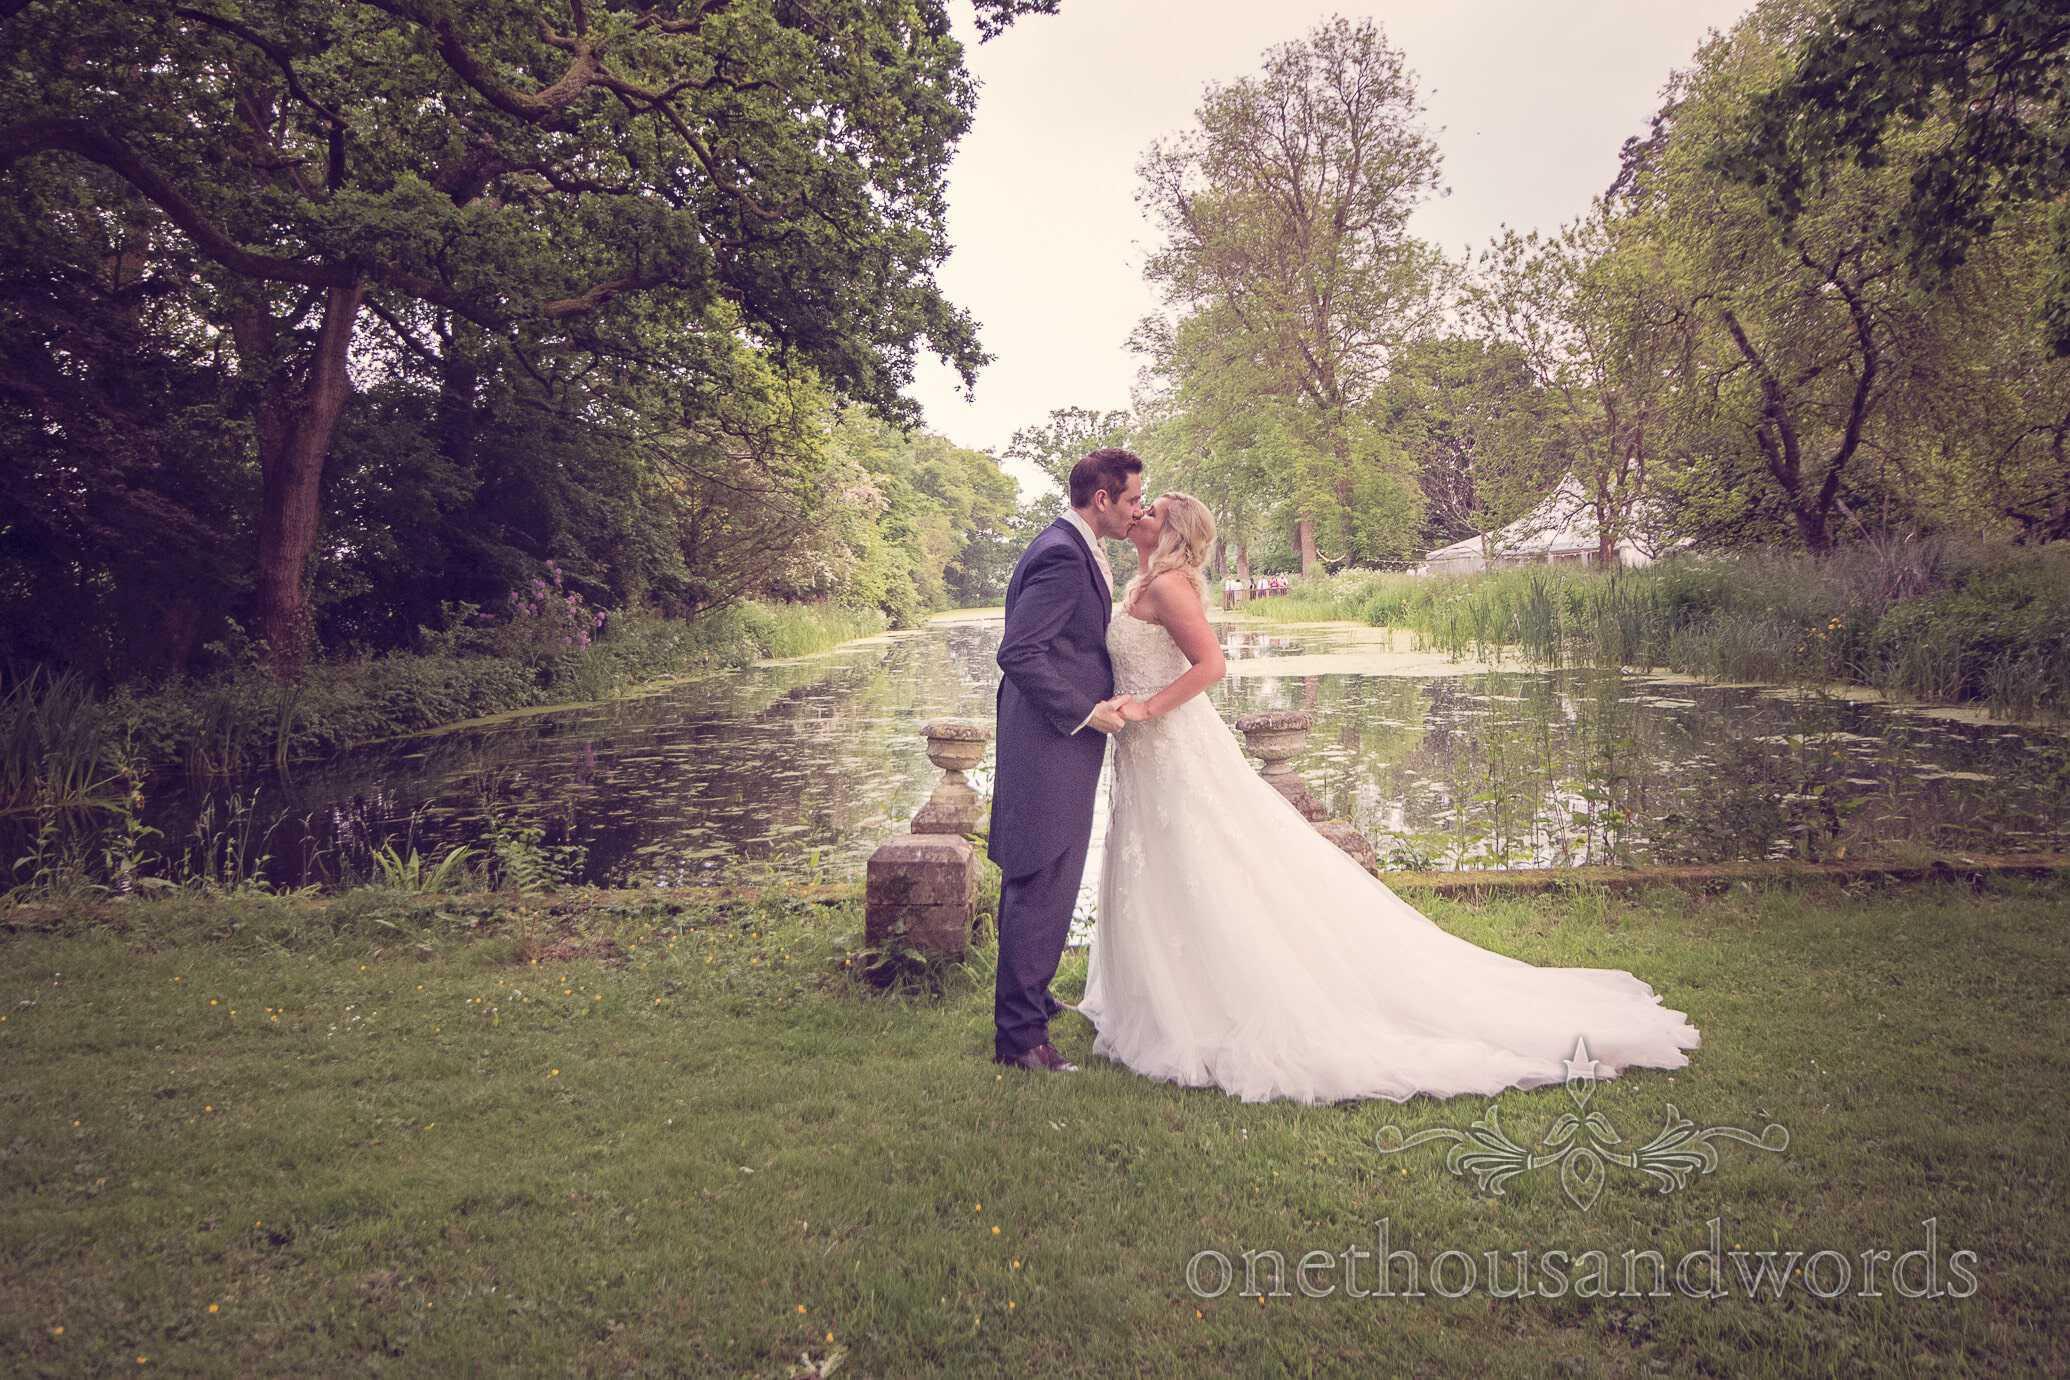 Laura & Luke's Deans Court Wedding Photographs Review